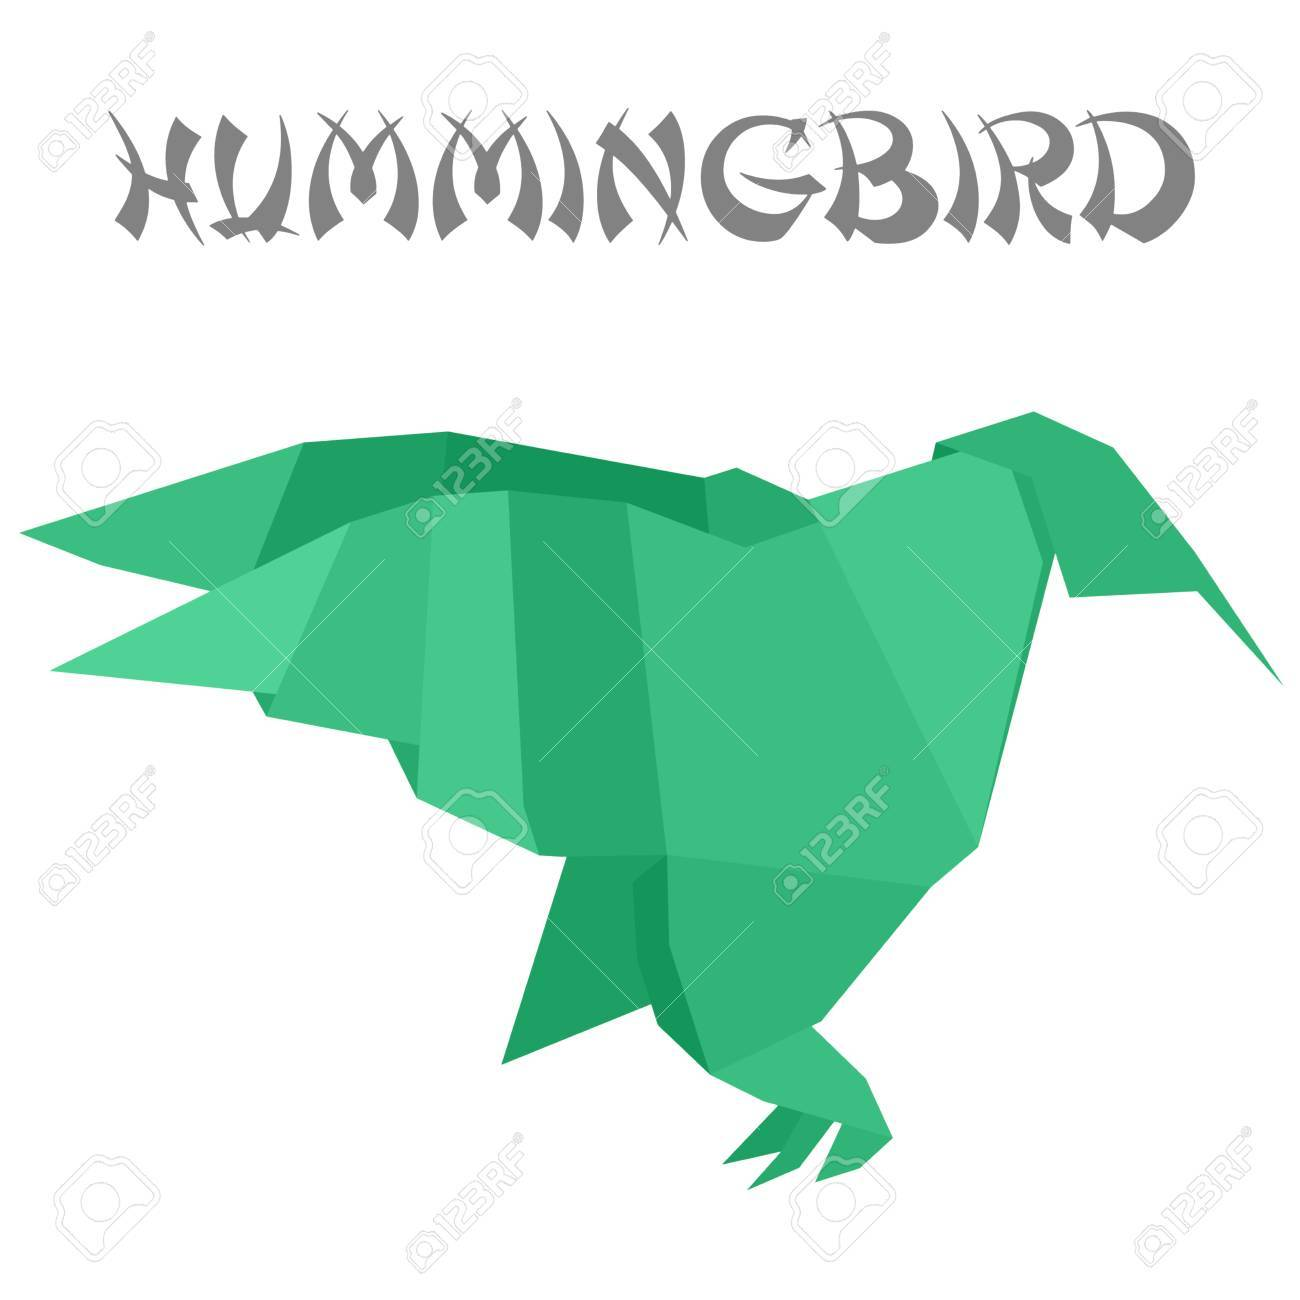 Origami hummingbird (a simple model) - OrigamiArt.Us   1300x1300